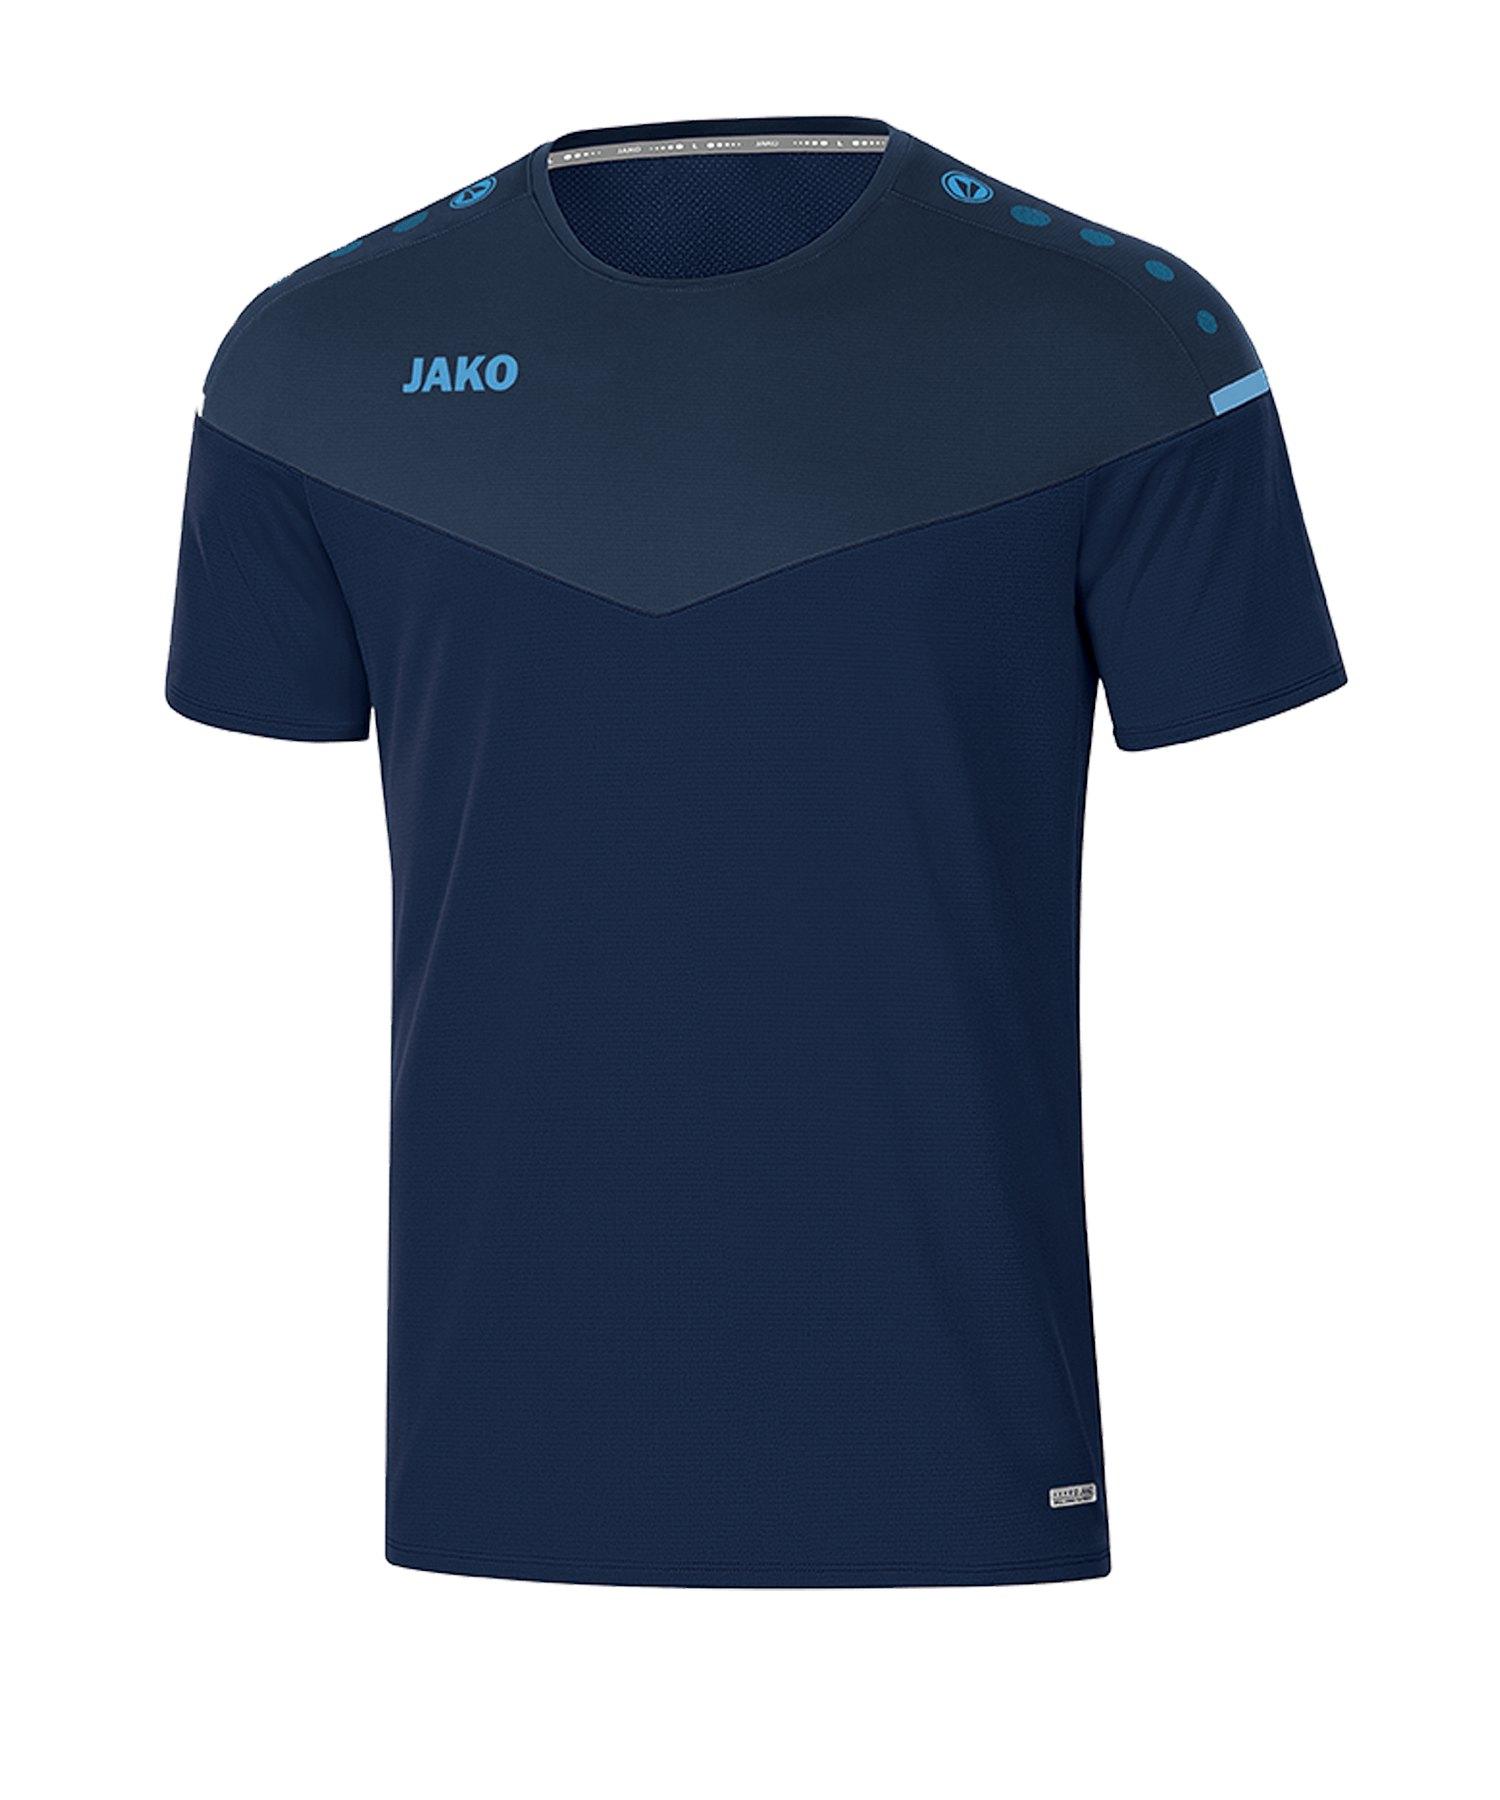 Jako Champ 2.0 T-Shirt Blau F95 - blau